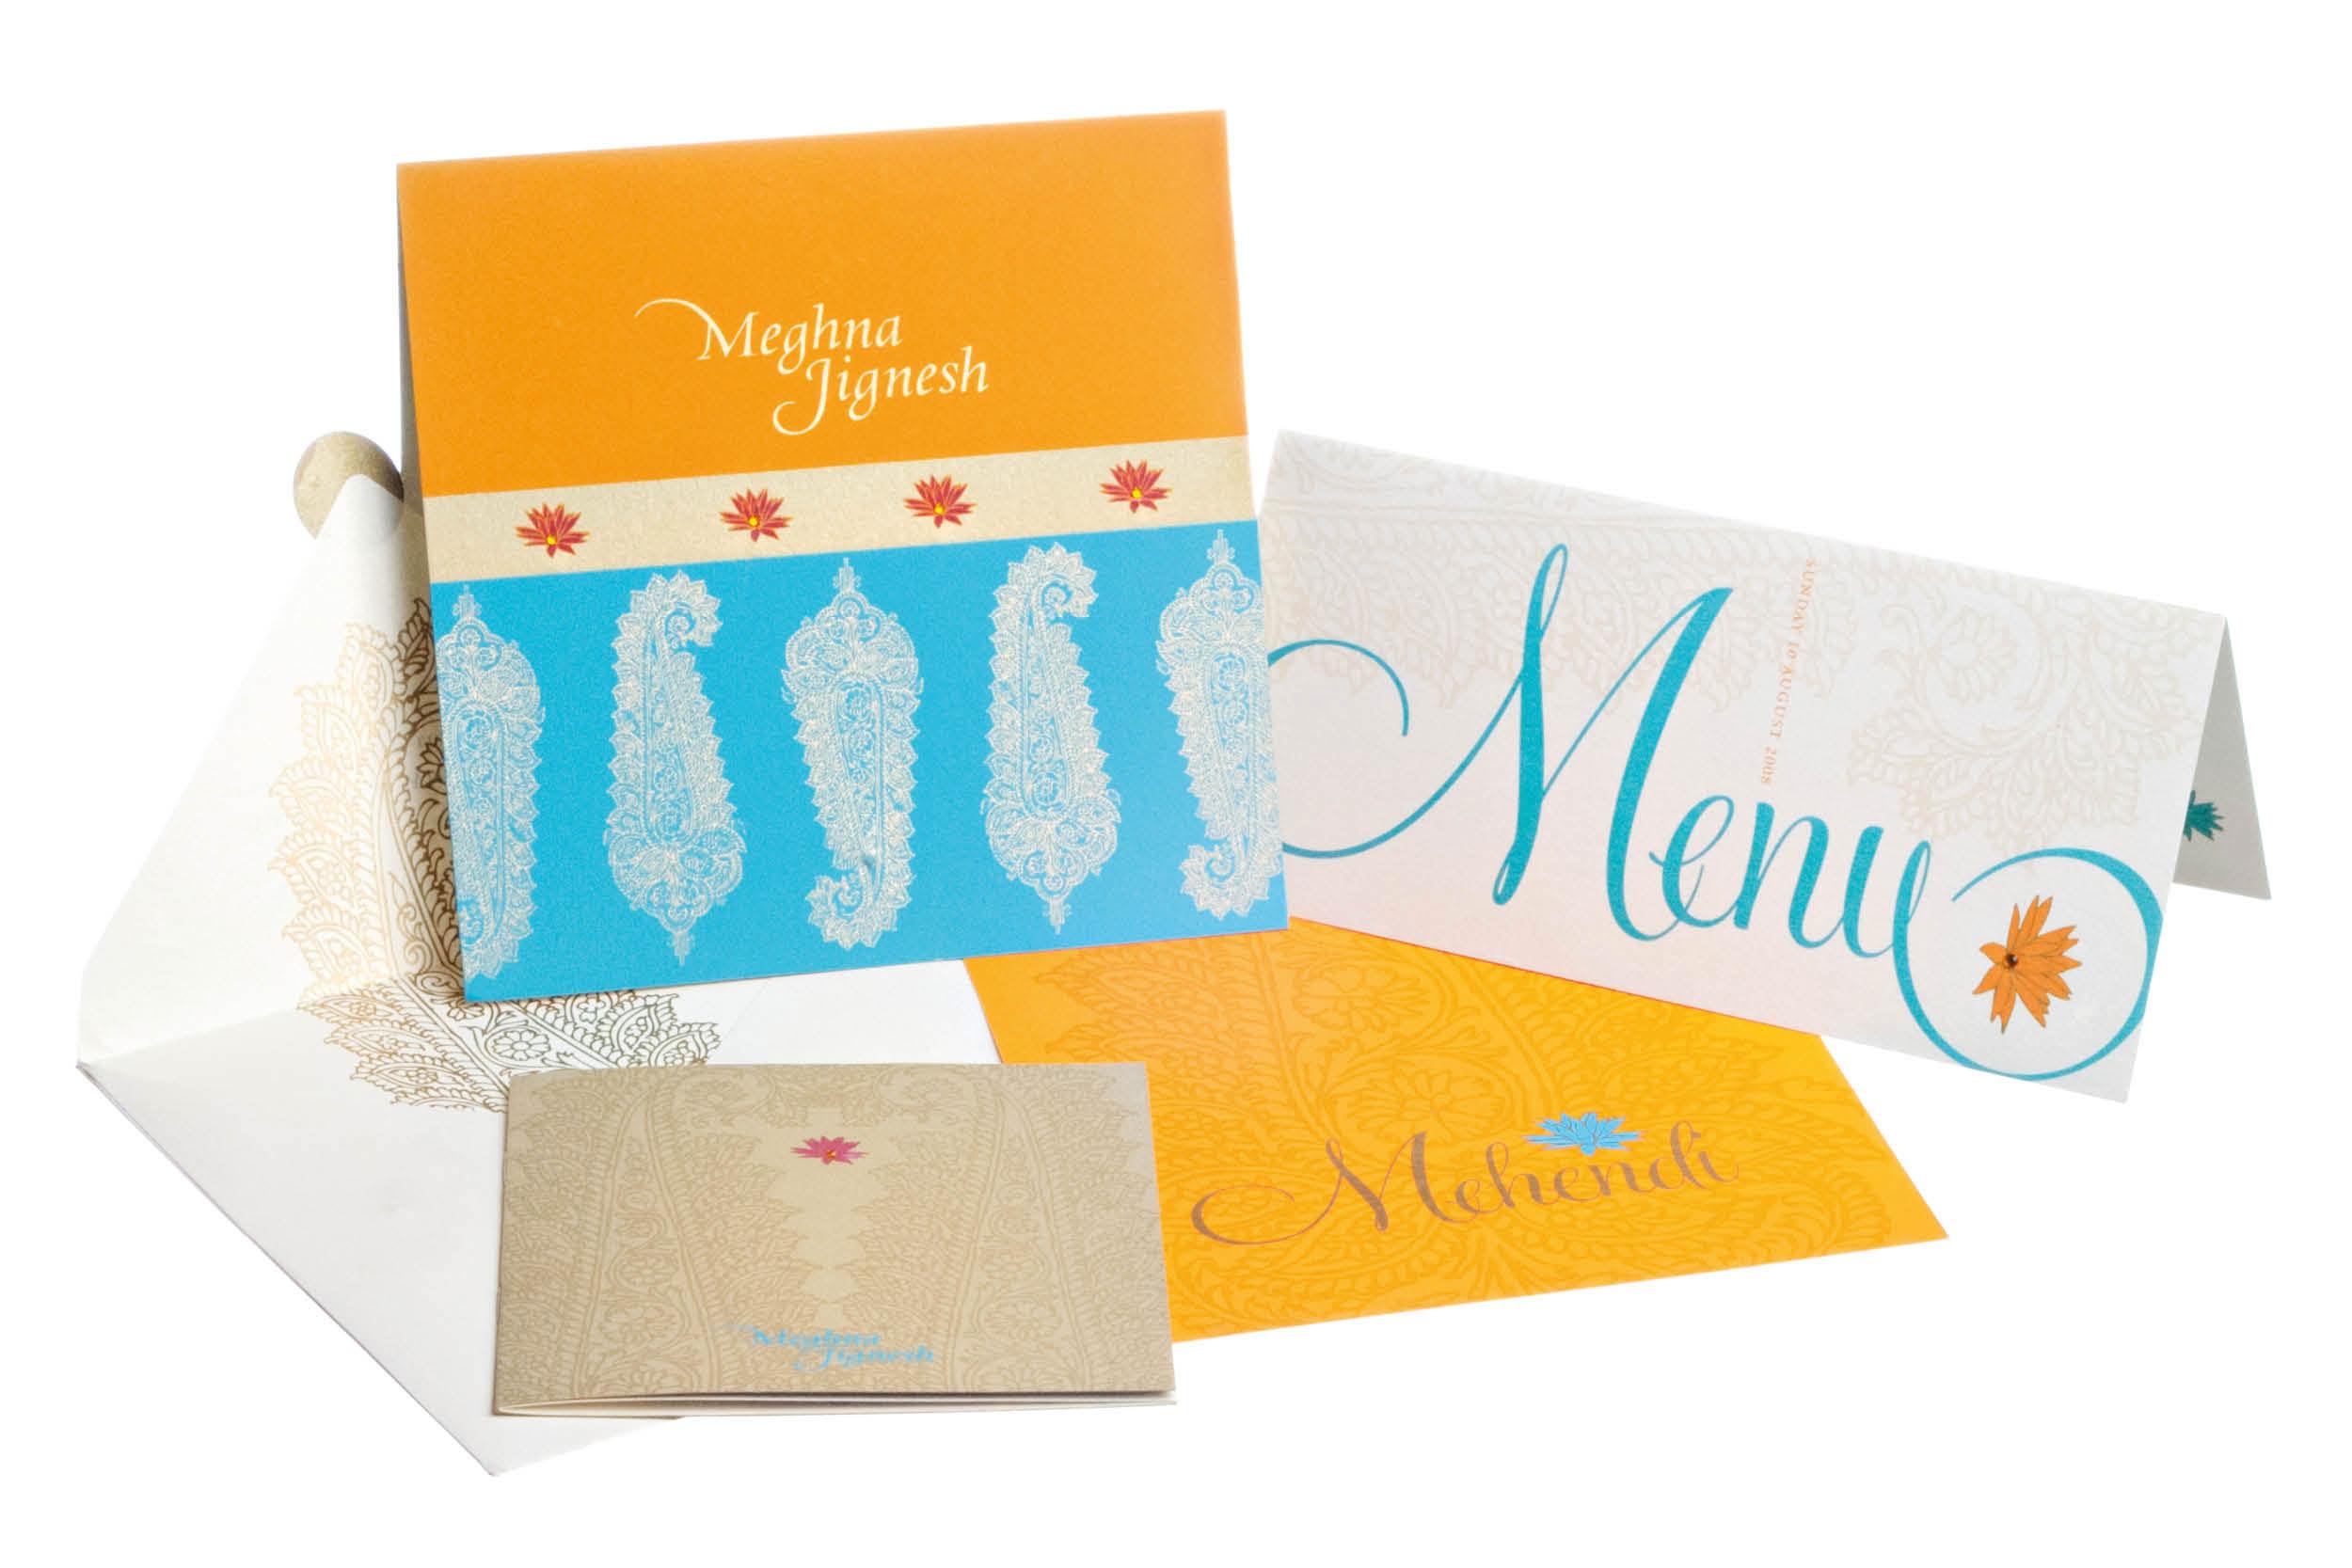 LotusPaisley_bespoke wedding stationery_ananyacards.com-02.jpg